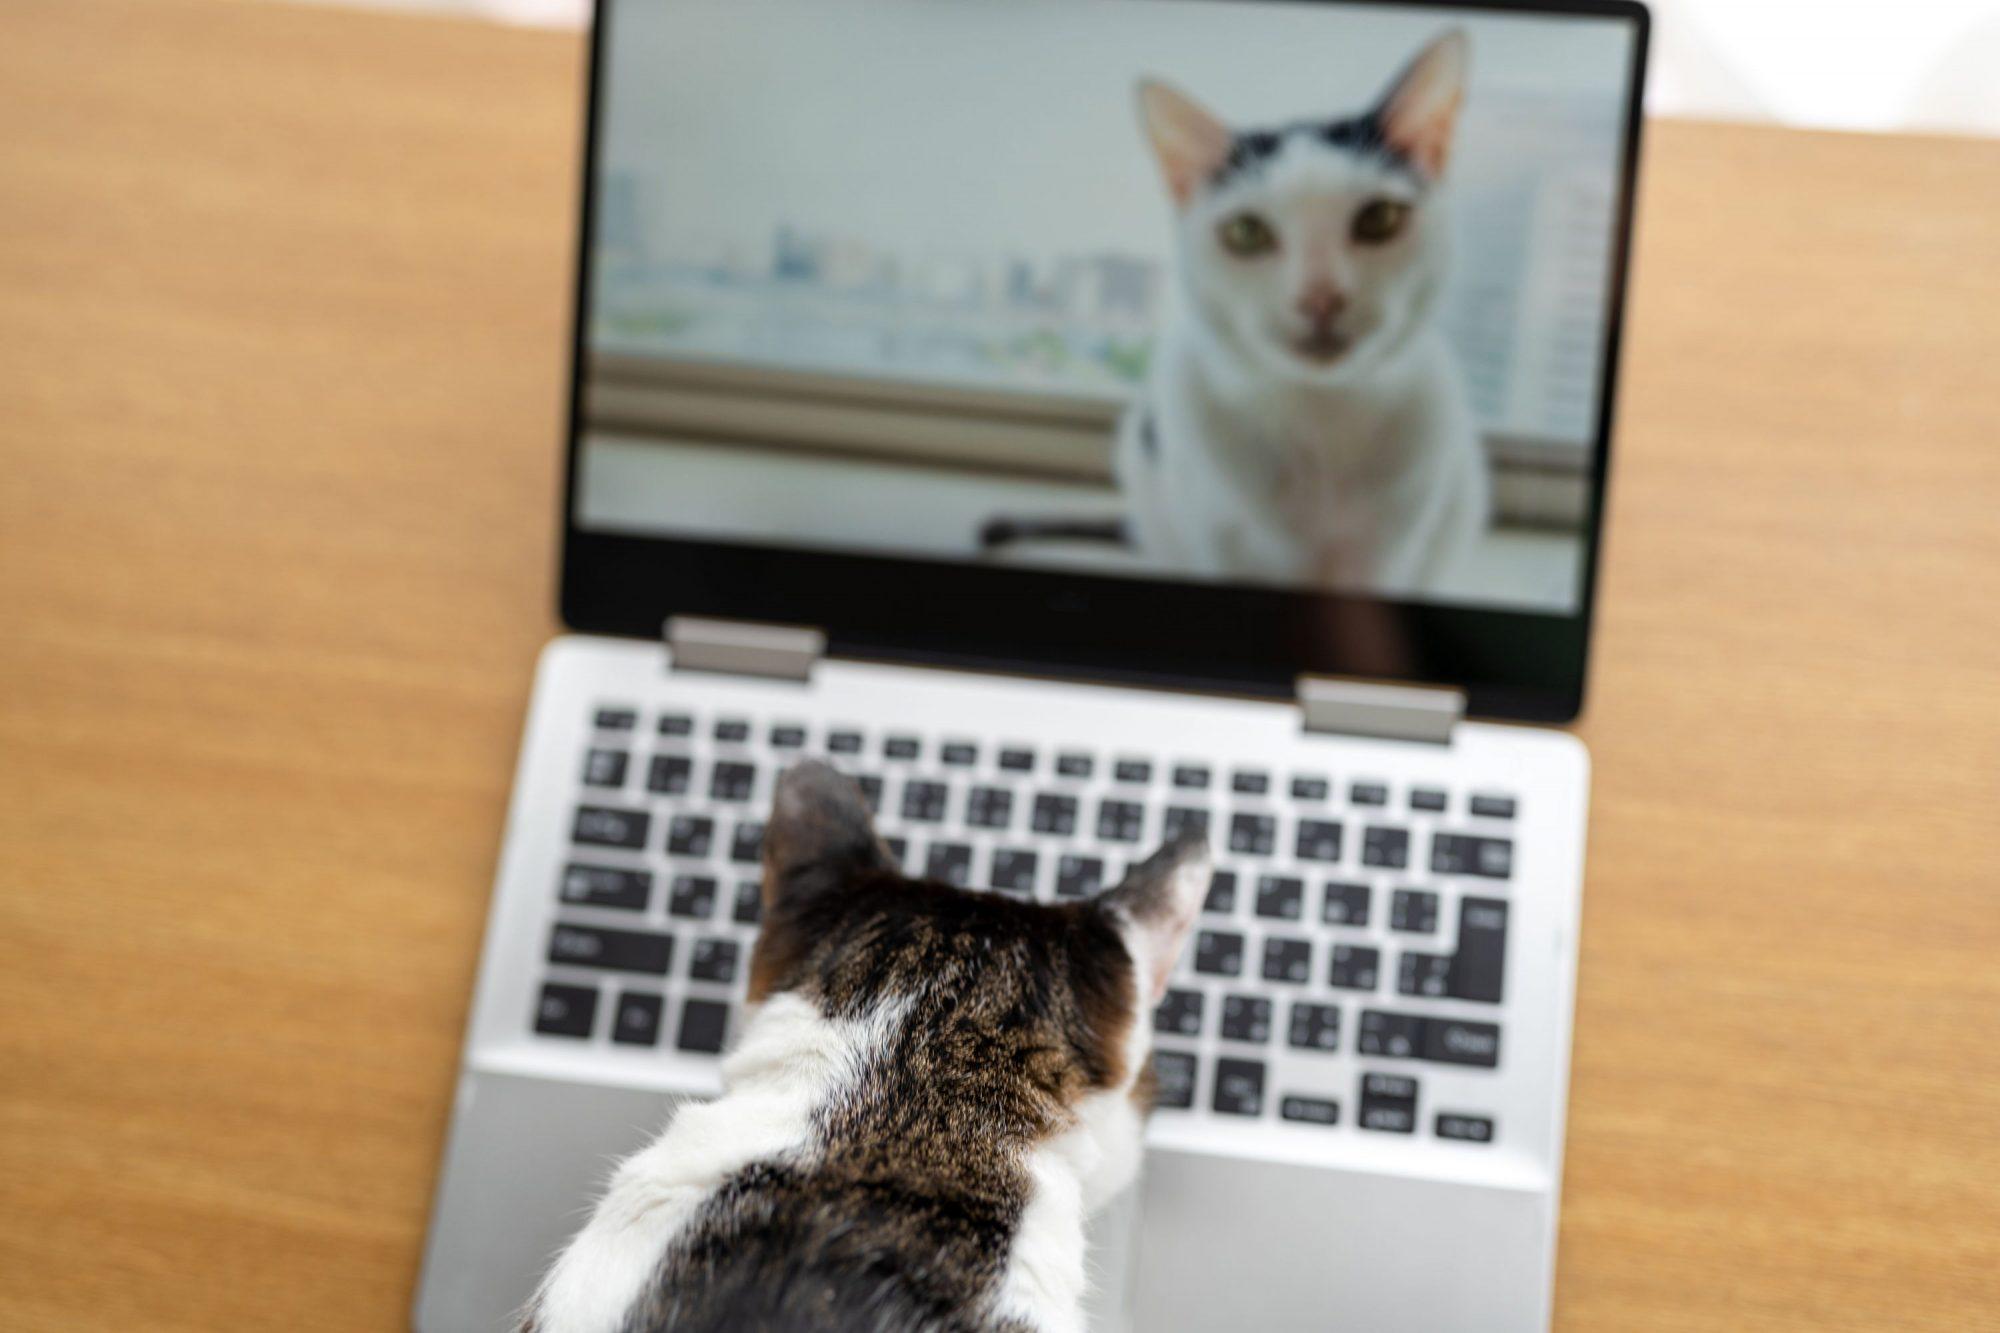 A cat checks out a veterinary website.